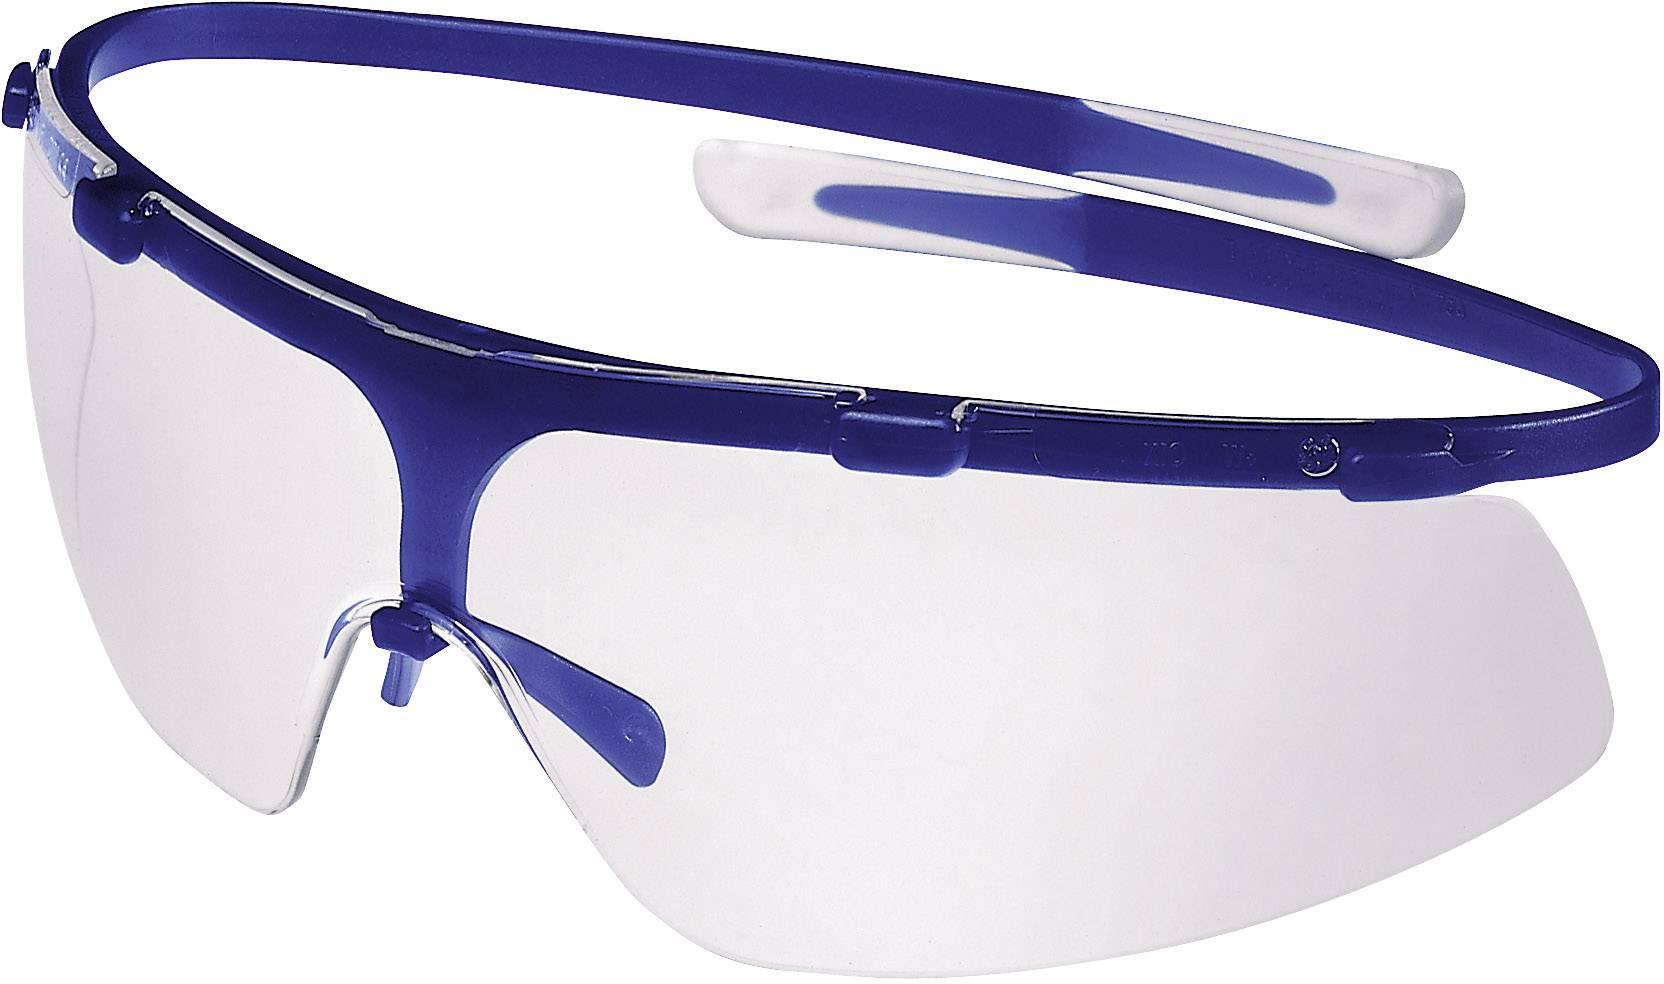 Ochranné okuliare Uvex SuperG, modré